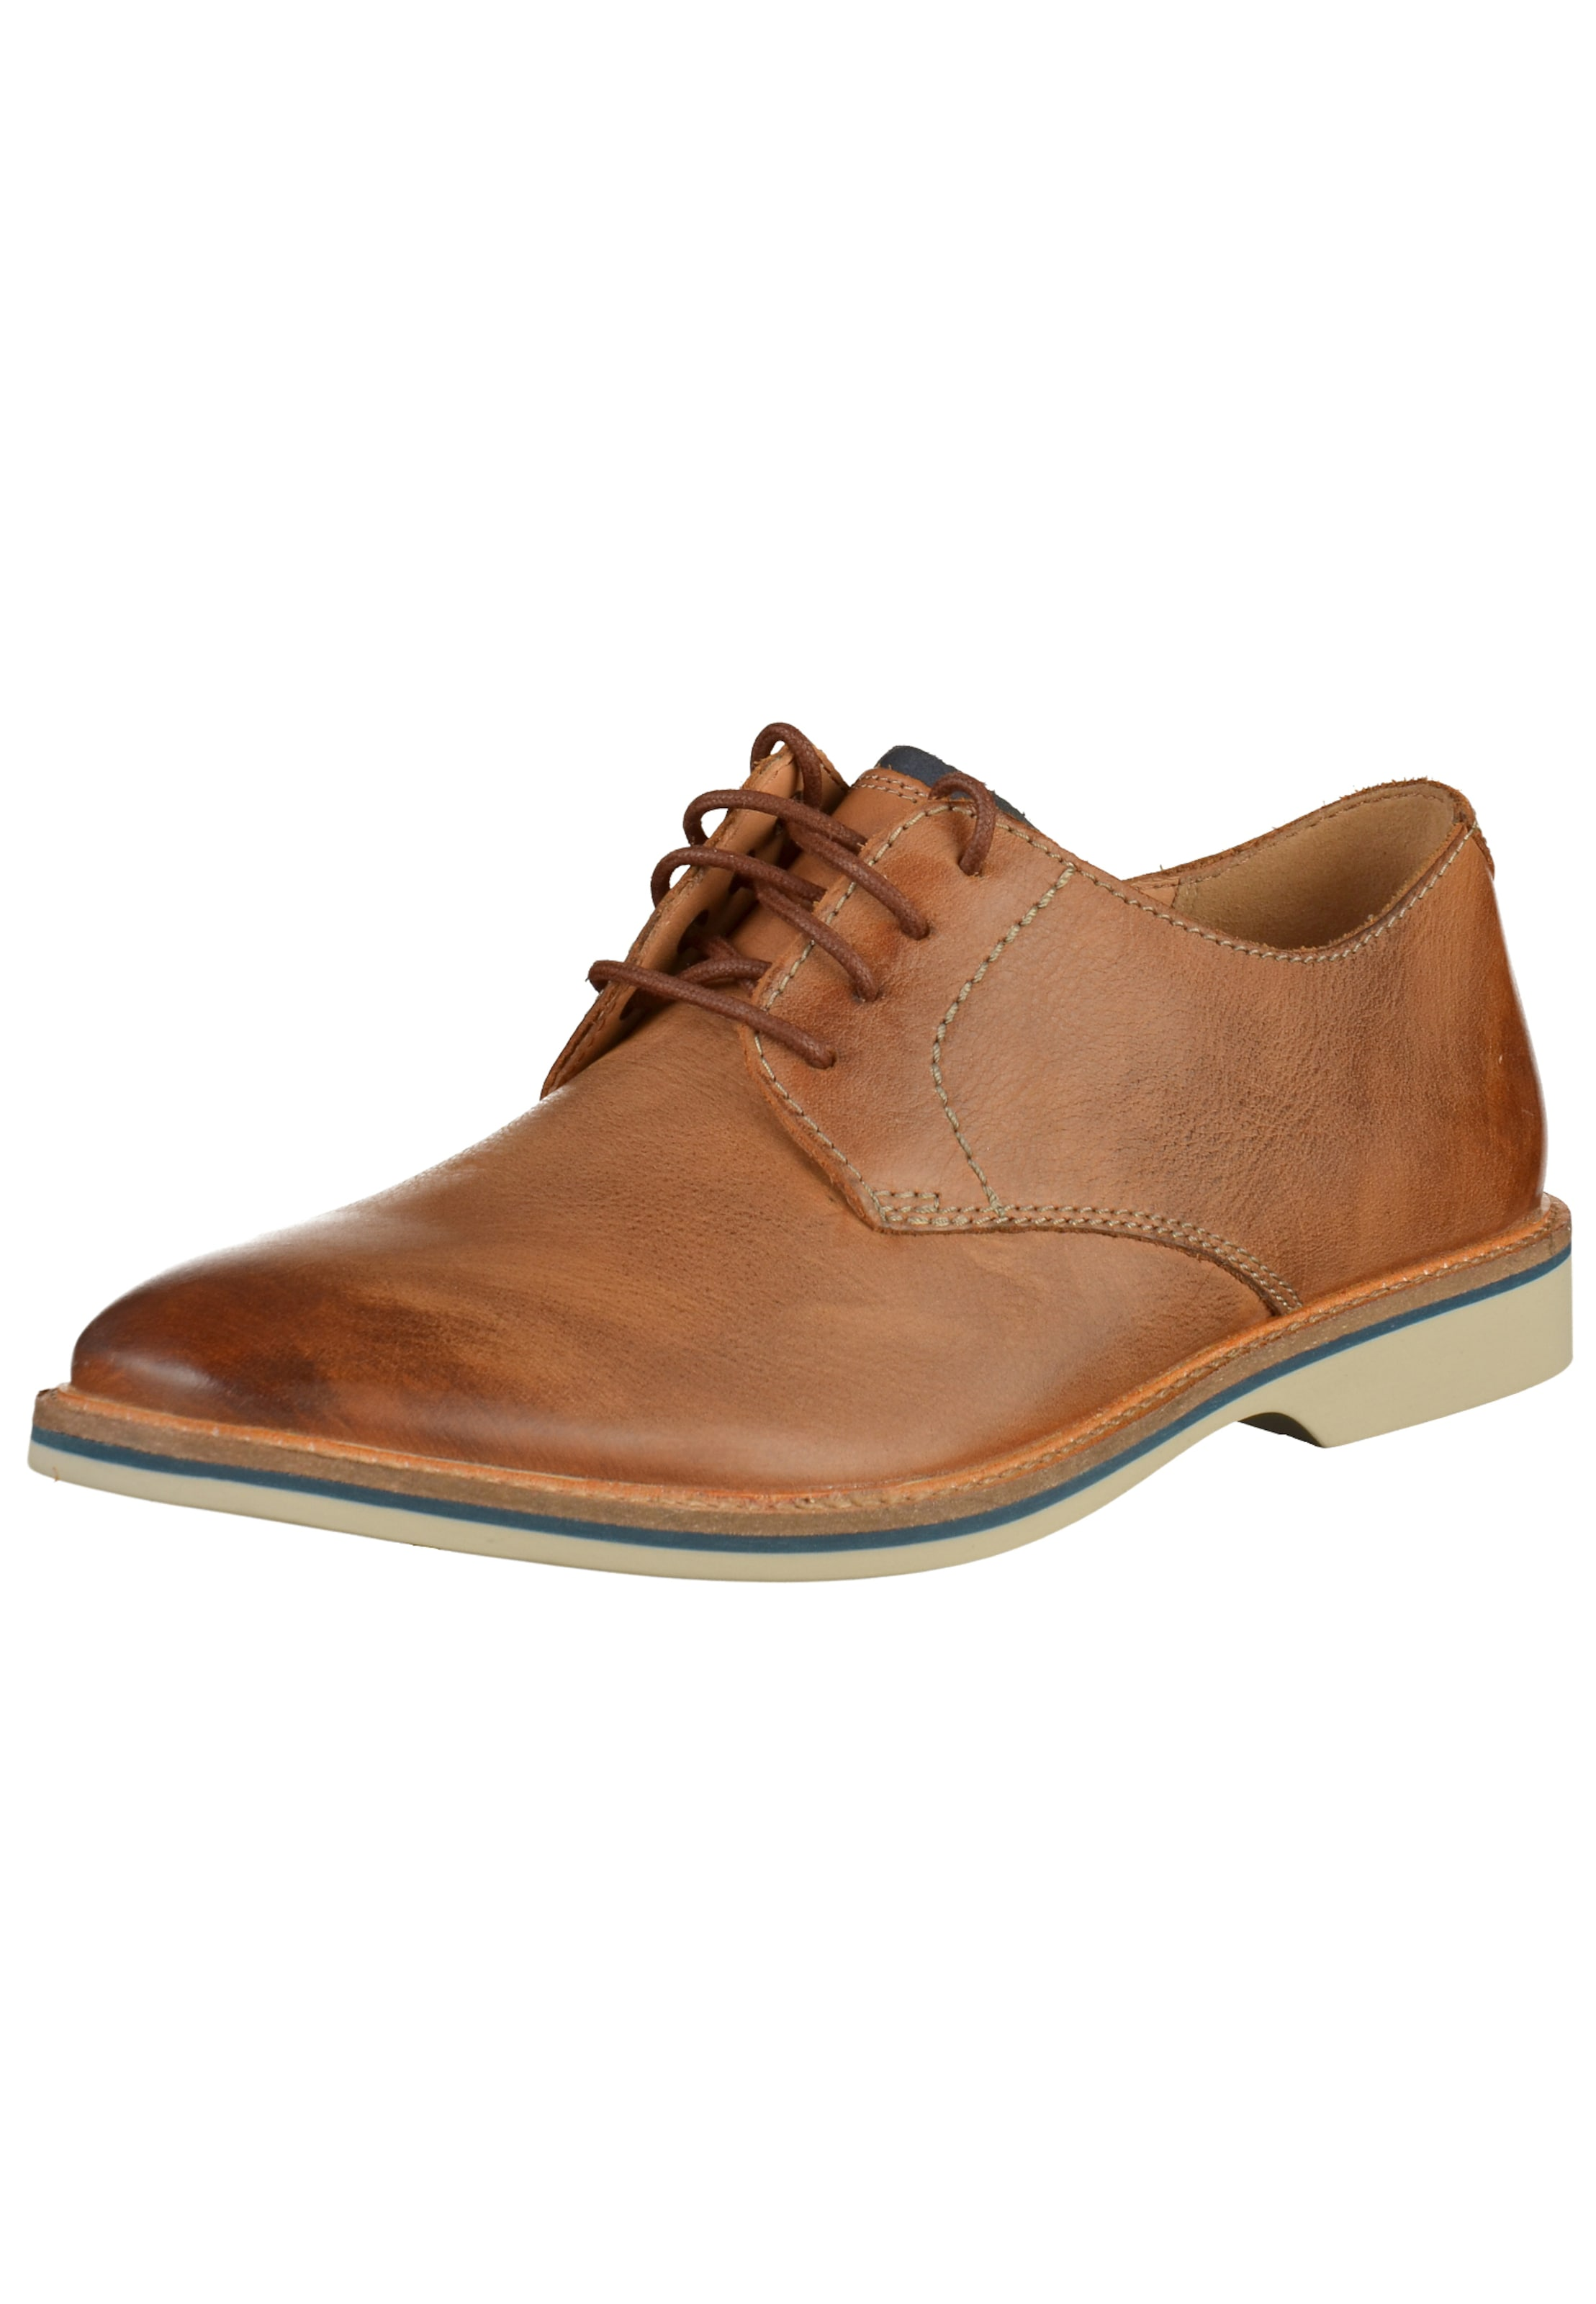 Haltbare Mode billige Schuhe CLARKS   Halbschuhe Schuhe Gut getragene Schuhe